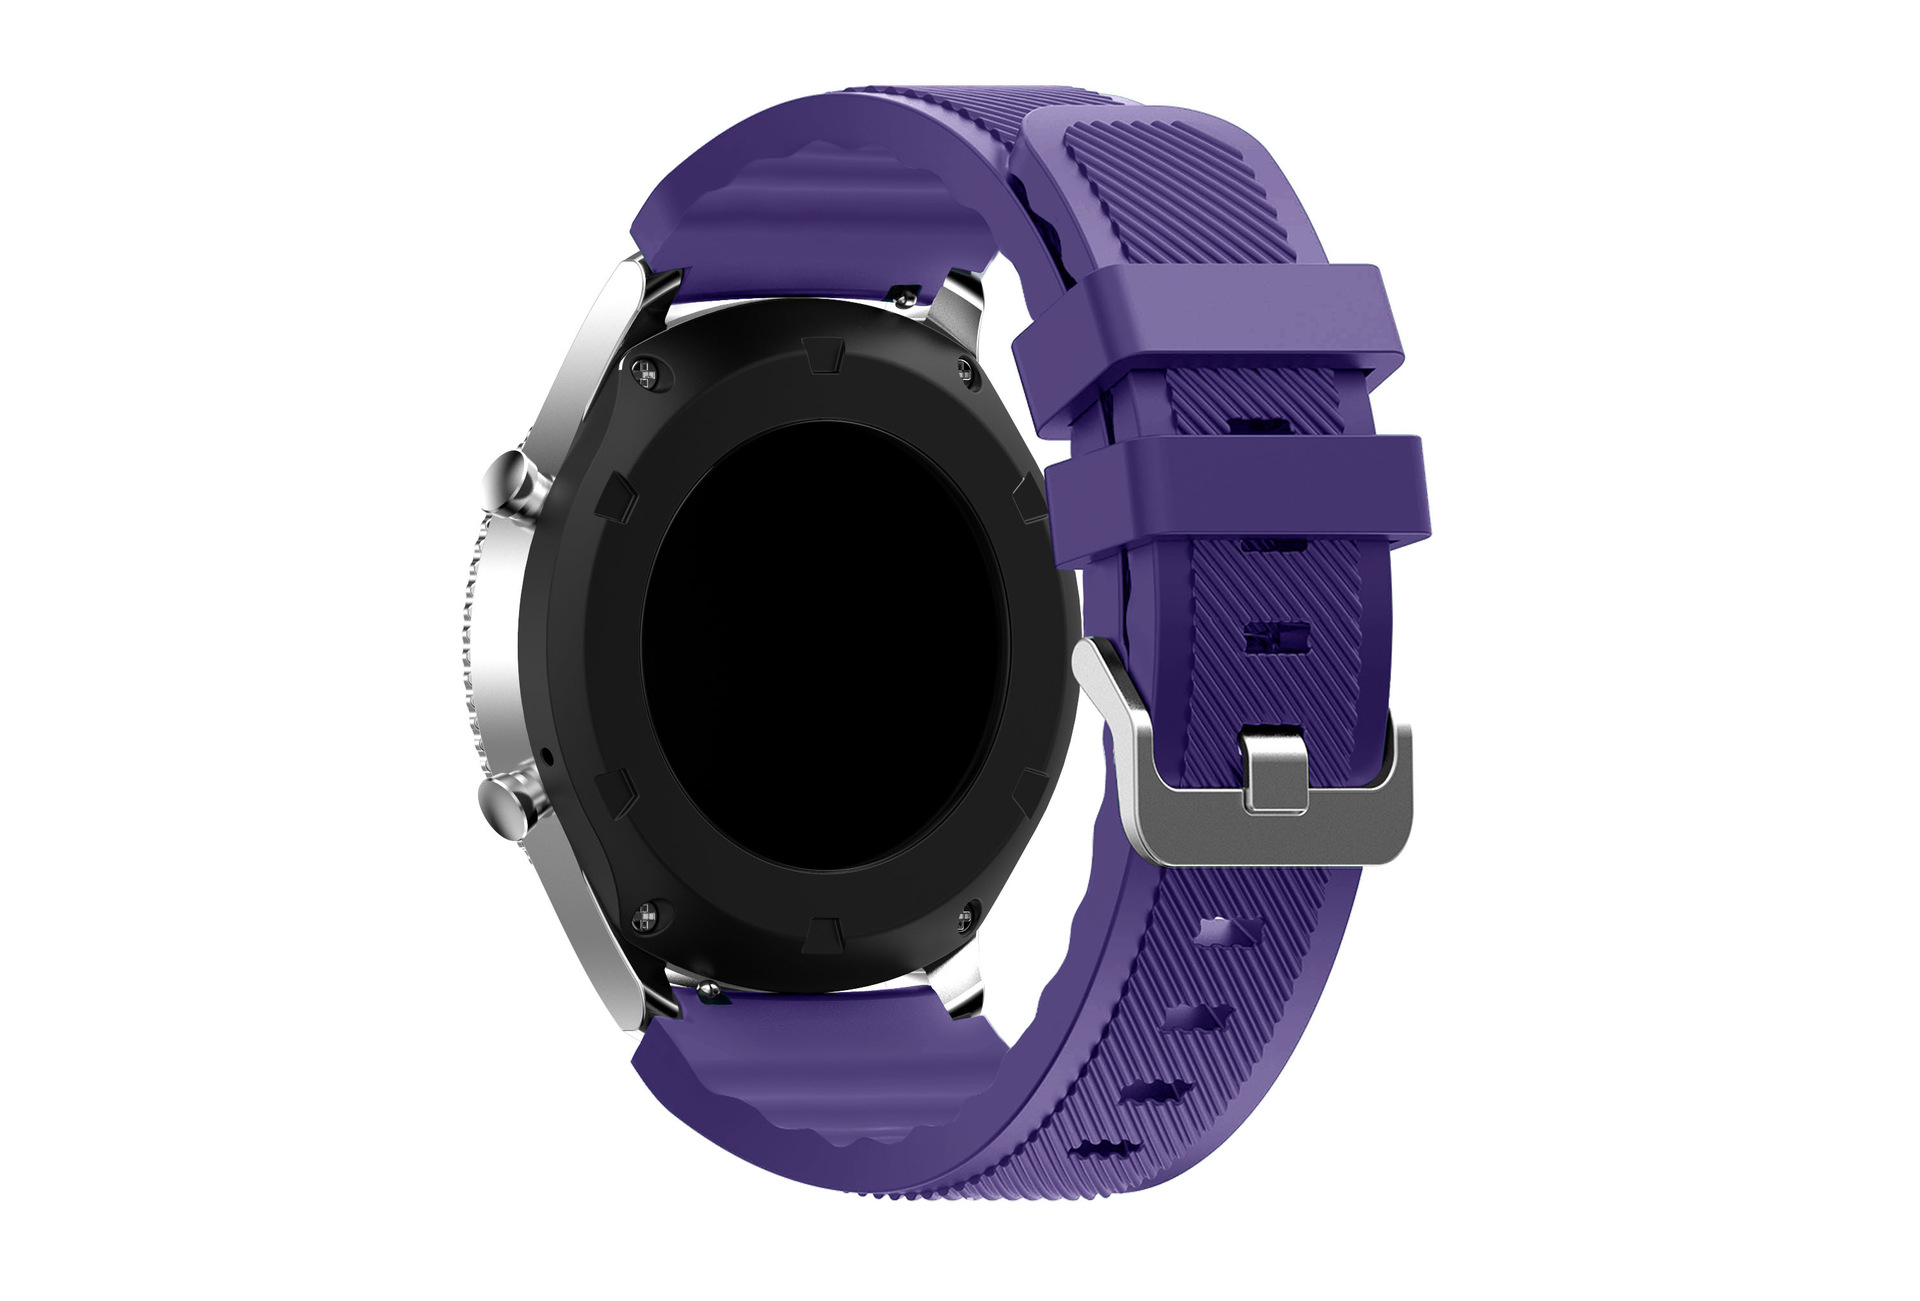 22MMS3 Silicone Watch Strap Samsung Gear S3 Silica Gel Fingerprint Breathing Watch Strap S3 Sports Watch Strap